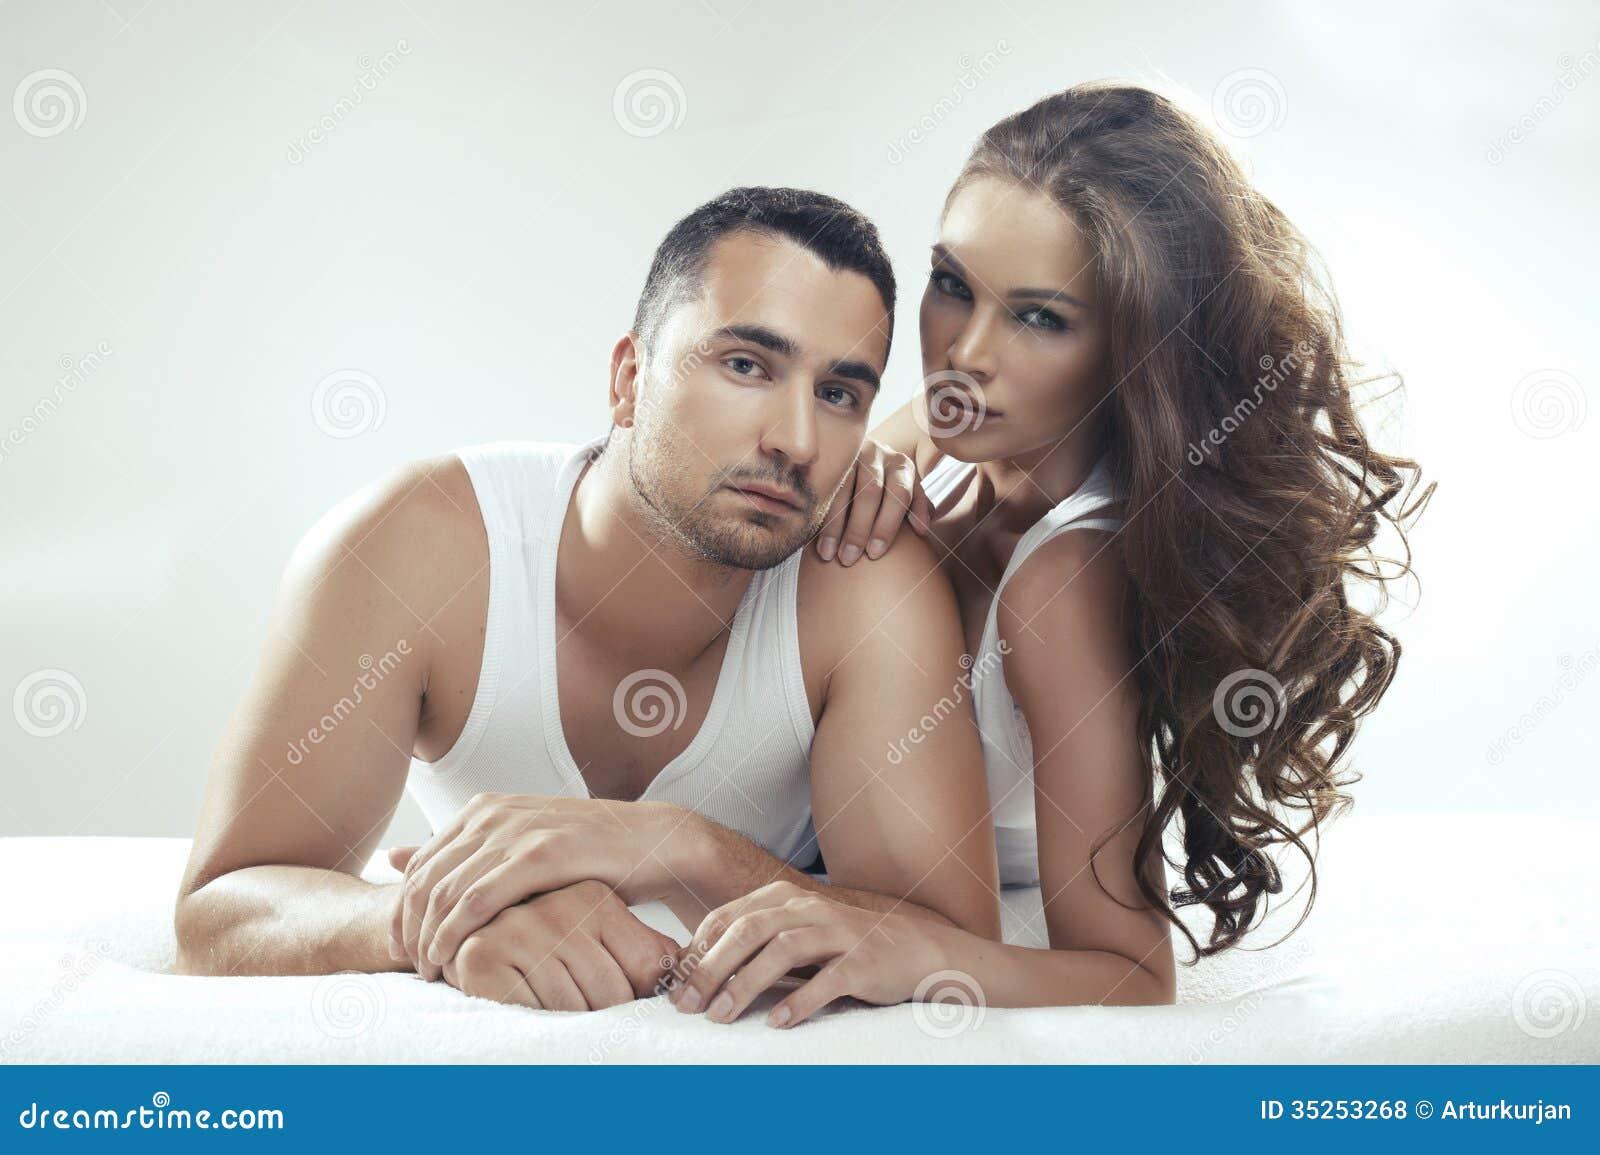 Couple couples video strapon porn